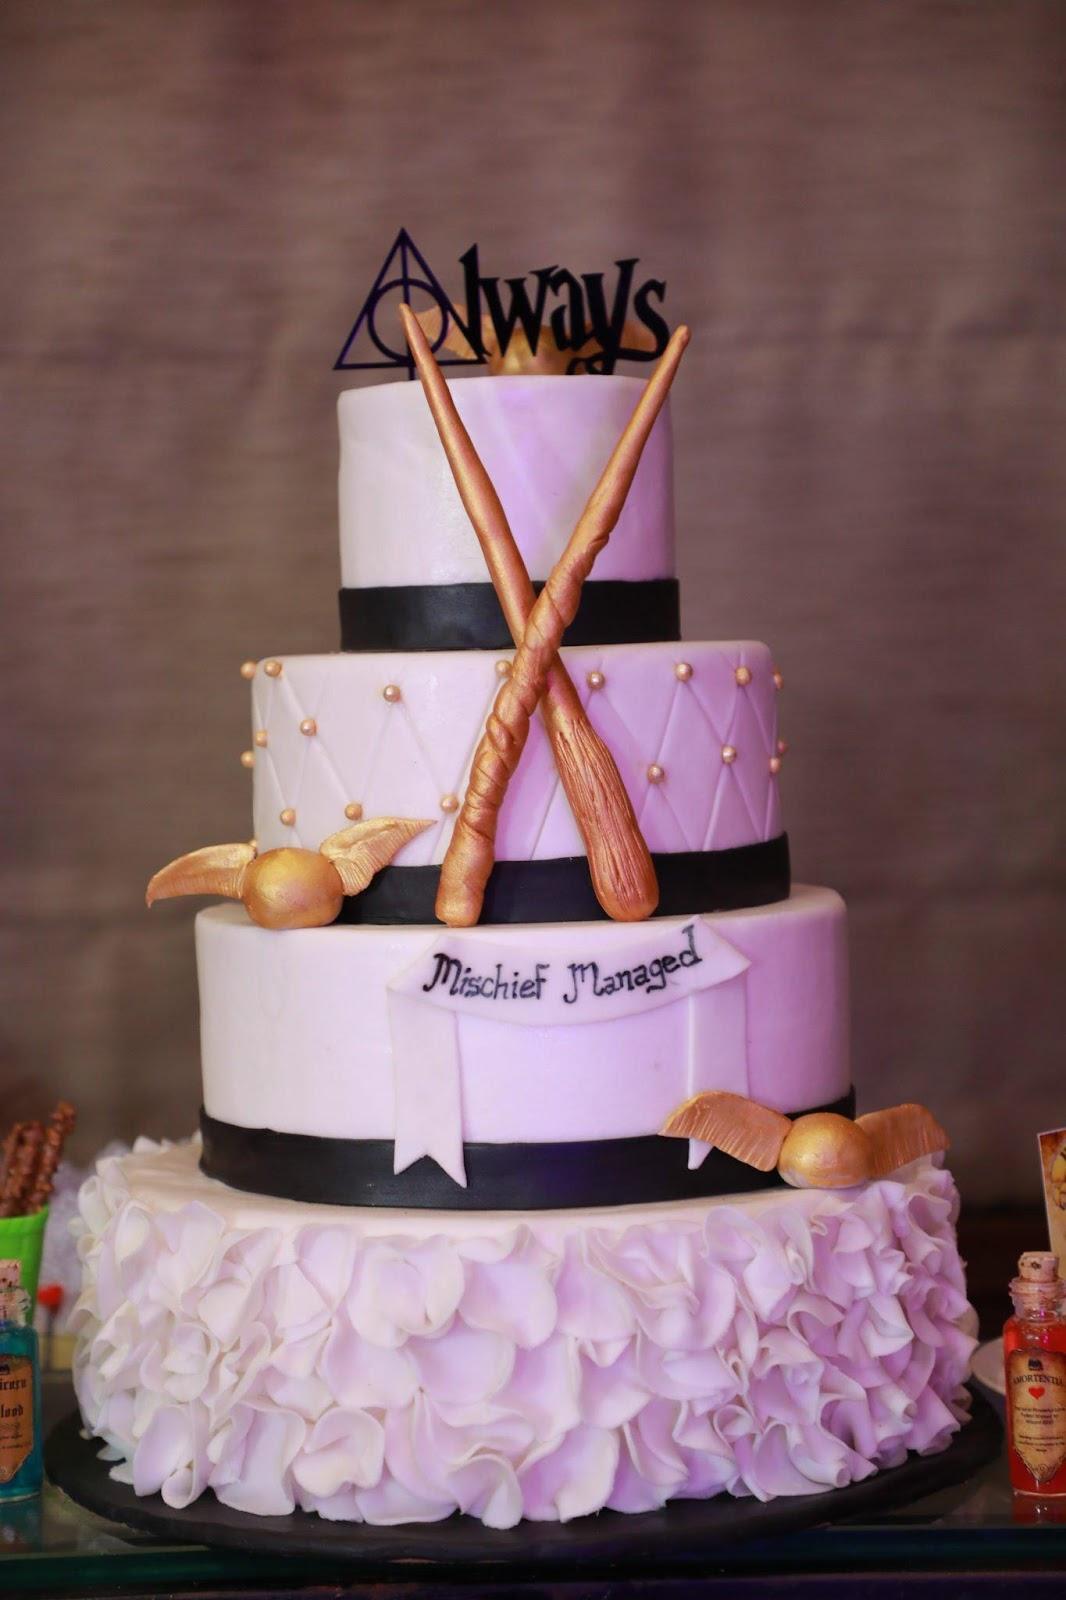 Function Mania   Sangeet Themes  Wedding Themes  Harry Potter Theme  Hollywood Sangeet Night  Wedding Inspiration  Wedding Cake  Wedding Decor  Sangeet Night